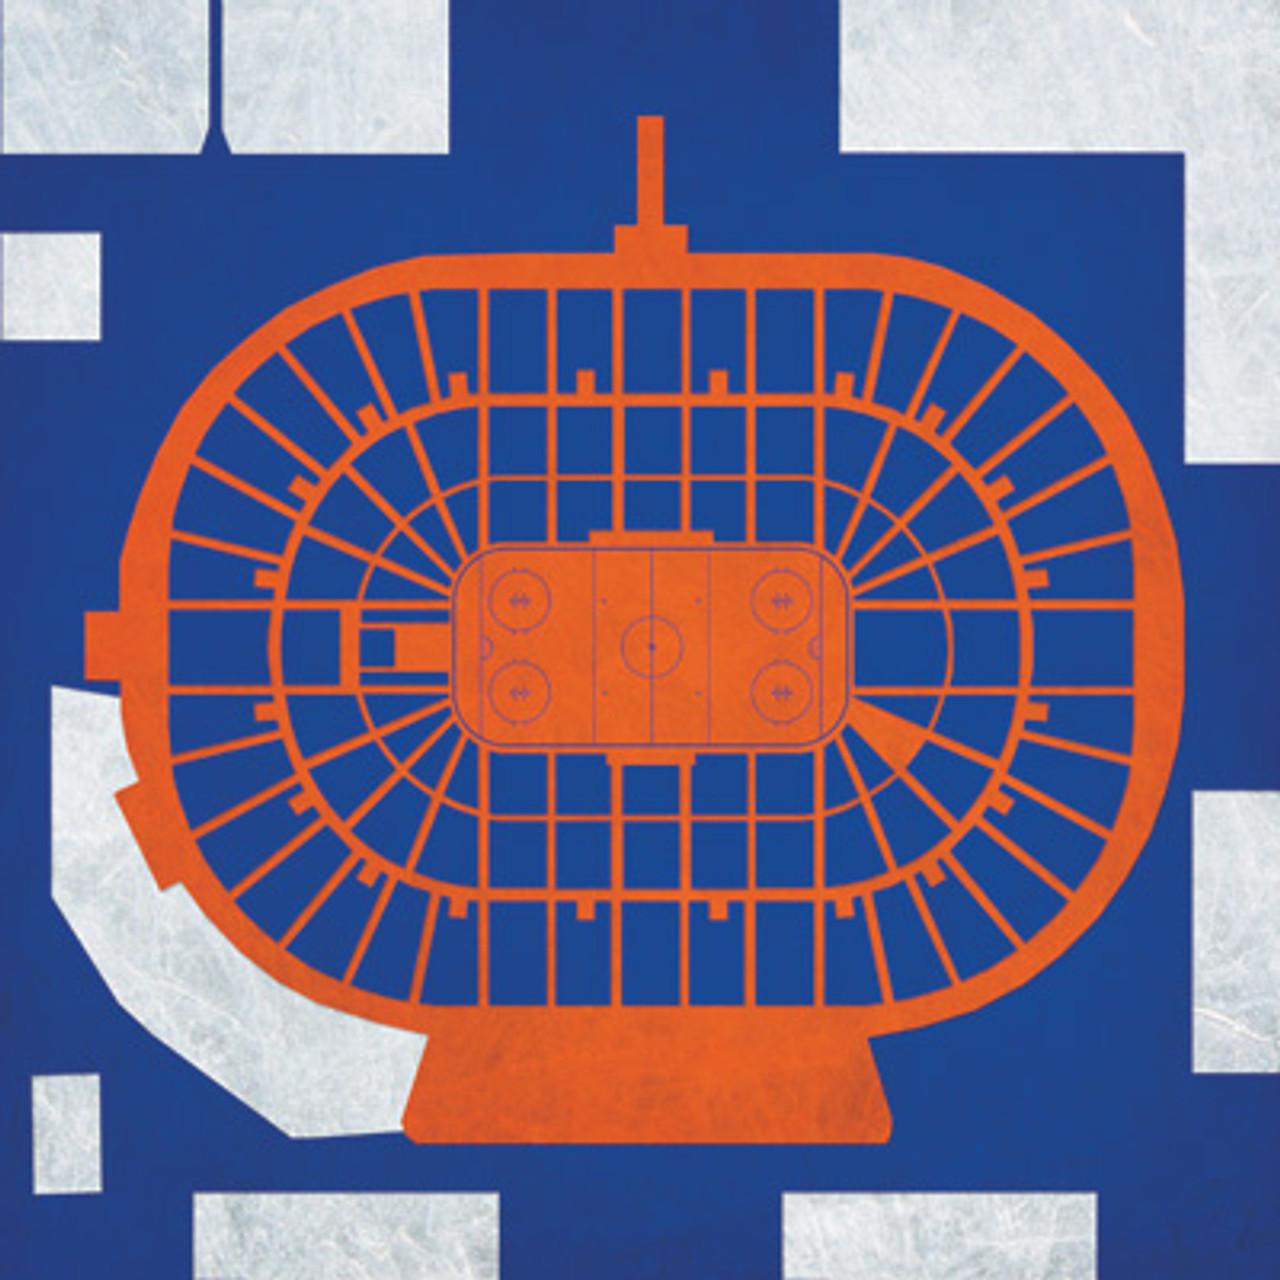 New York Islanders - Nassau Memorial Coliseum City Print